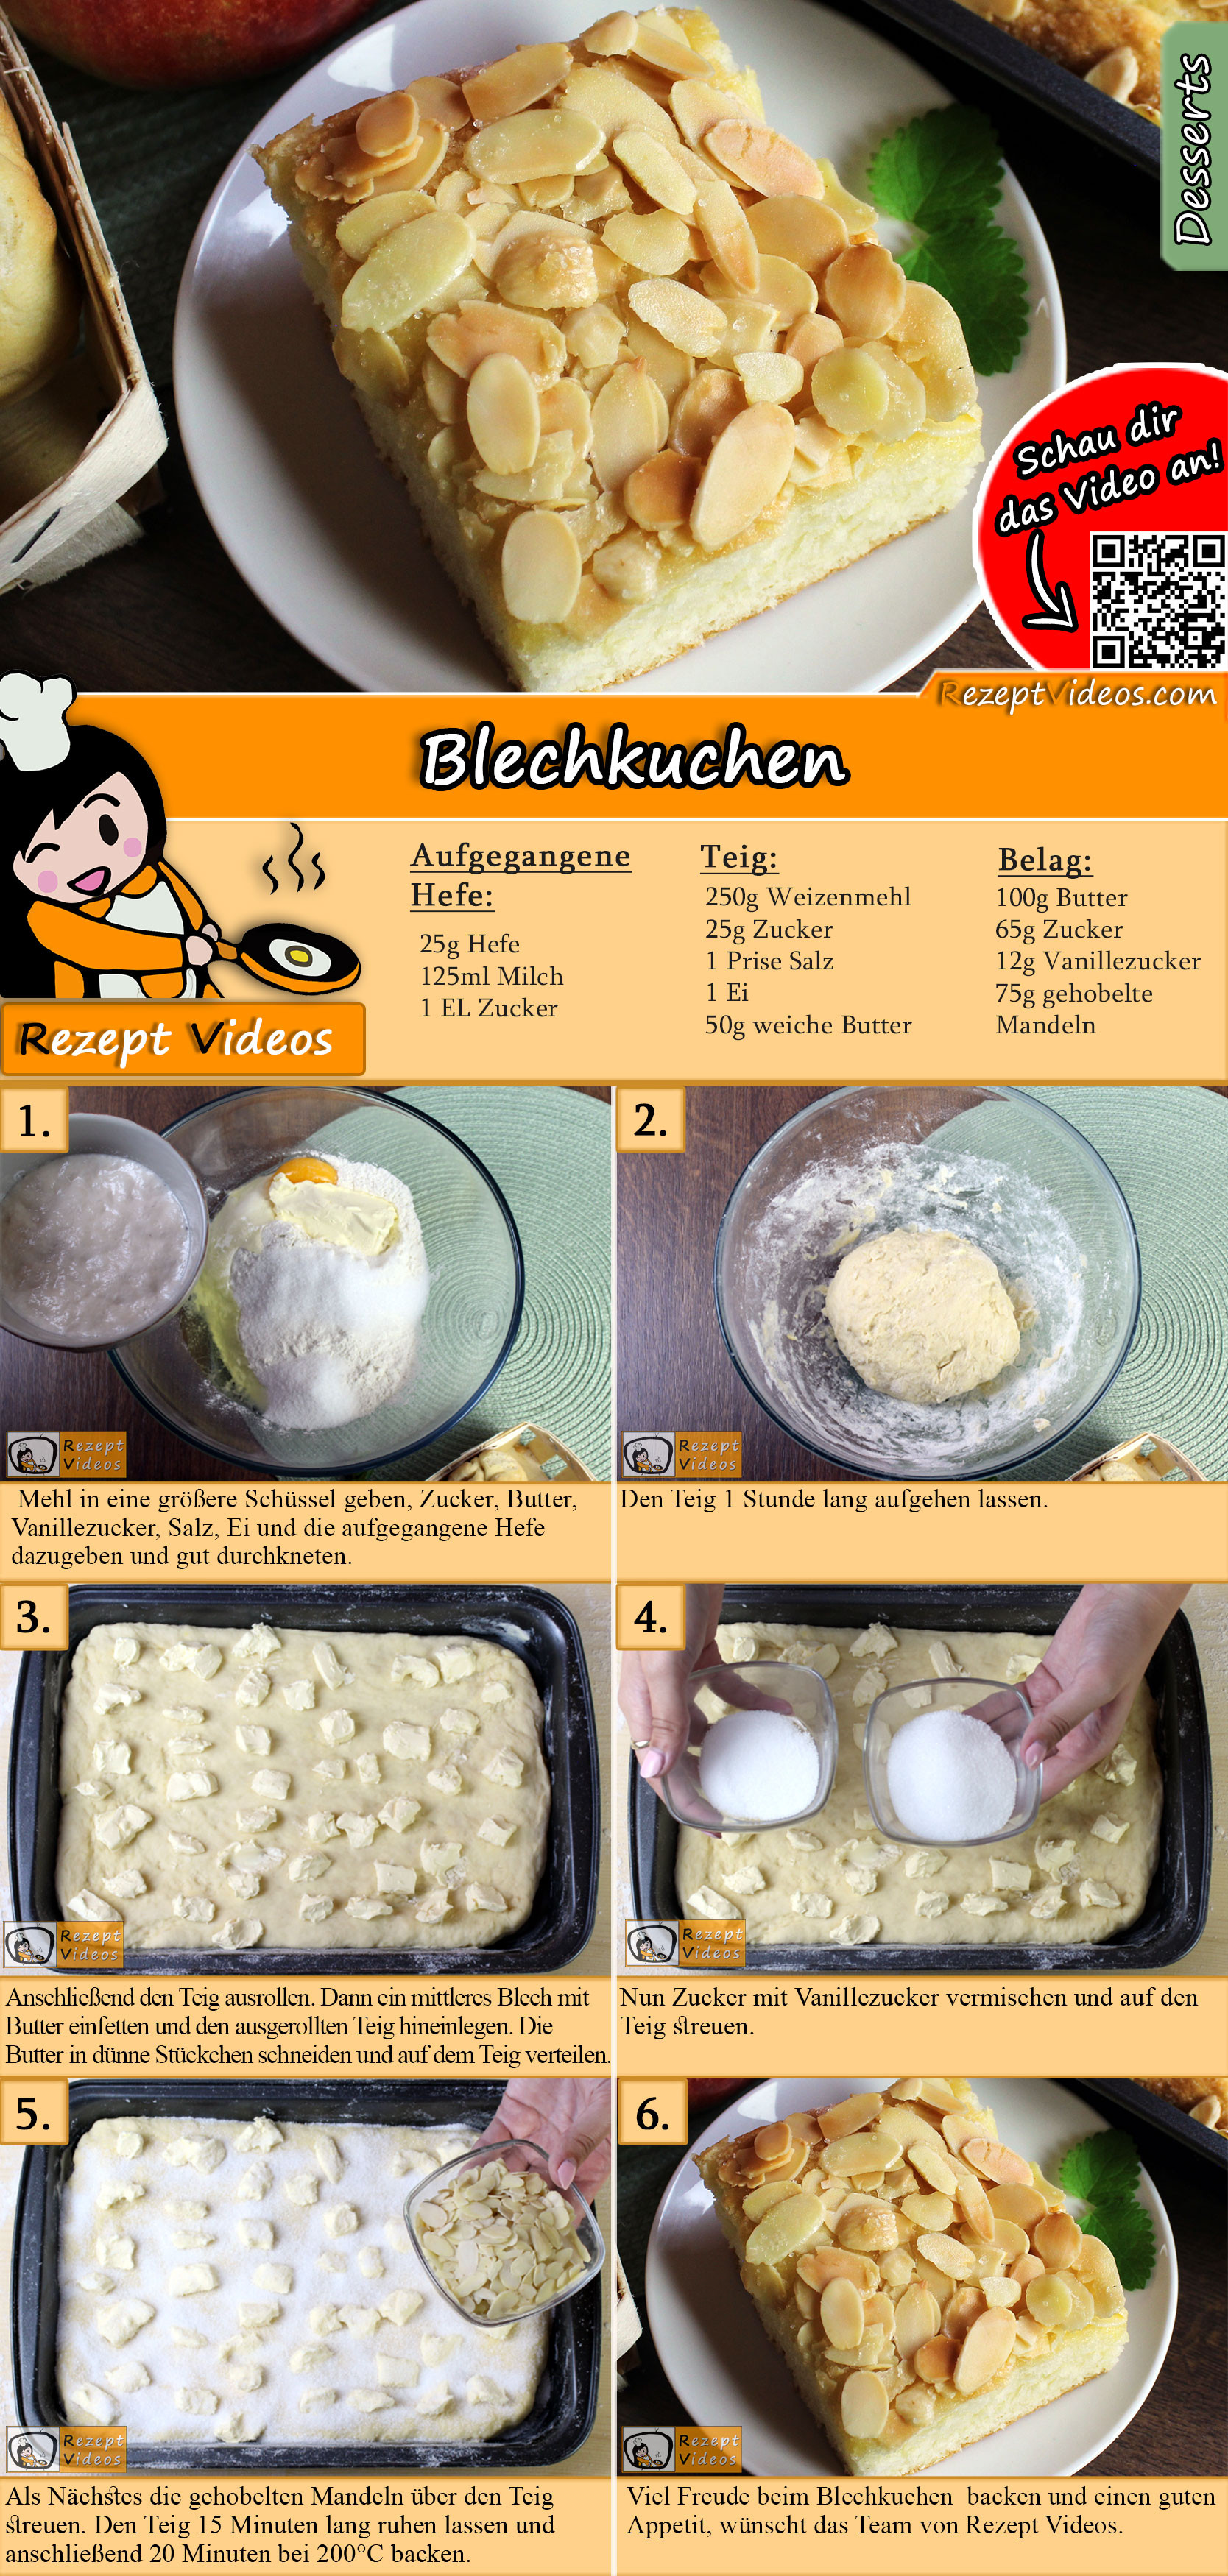 Blechkuchen Rezept mit Video